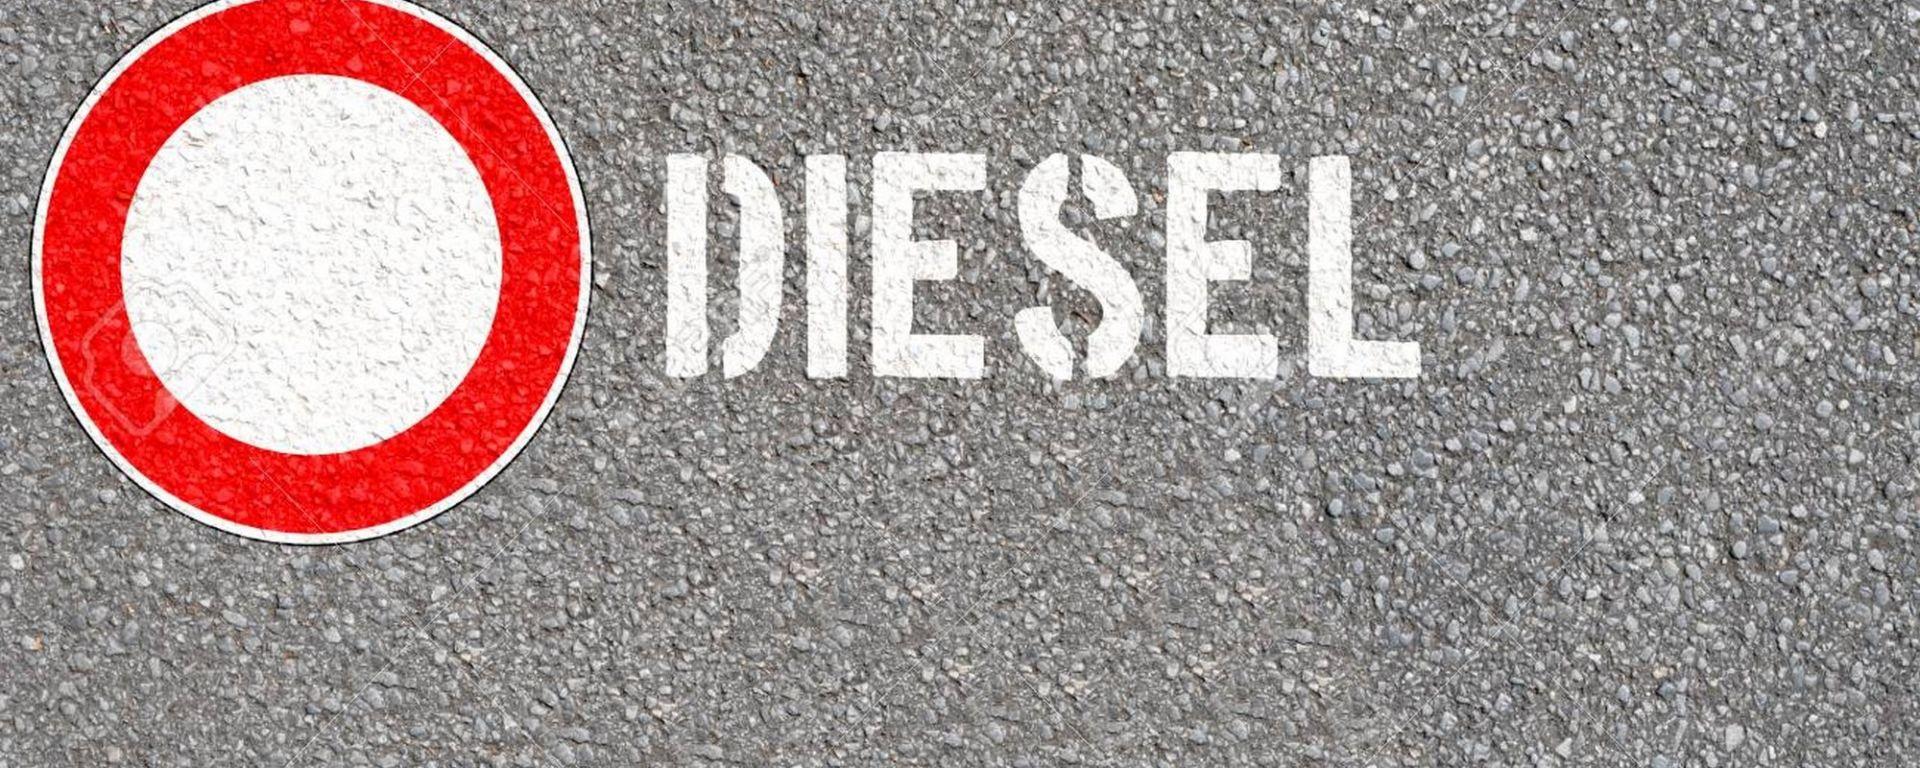 Stop ai diesel Euro 3 ed Euro 4, i blocchi regione per regione